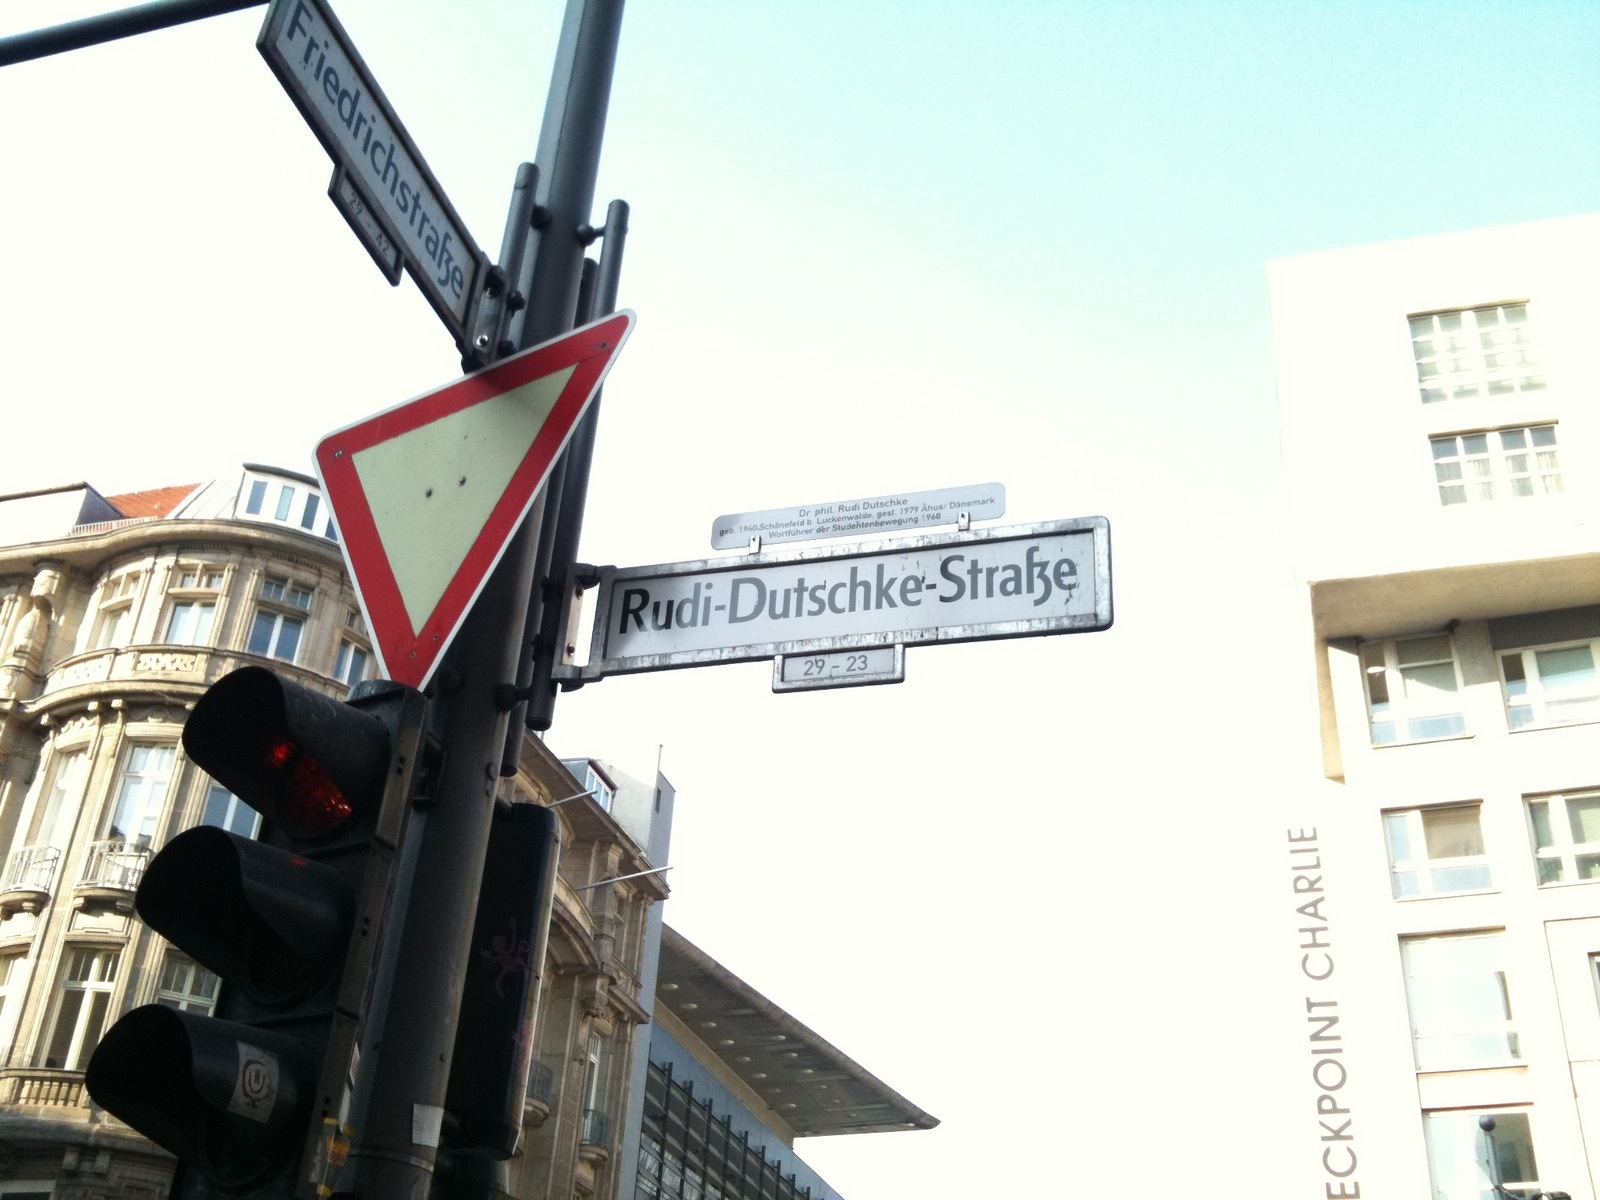 Rue Rudi Dutschke. Berlin, 4 mars 2011